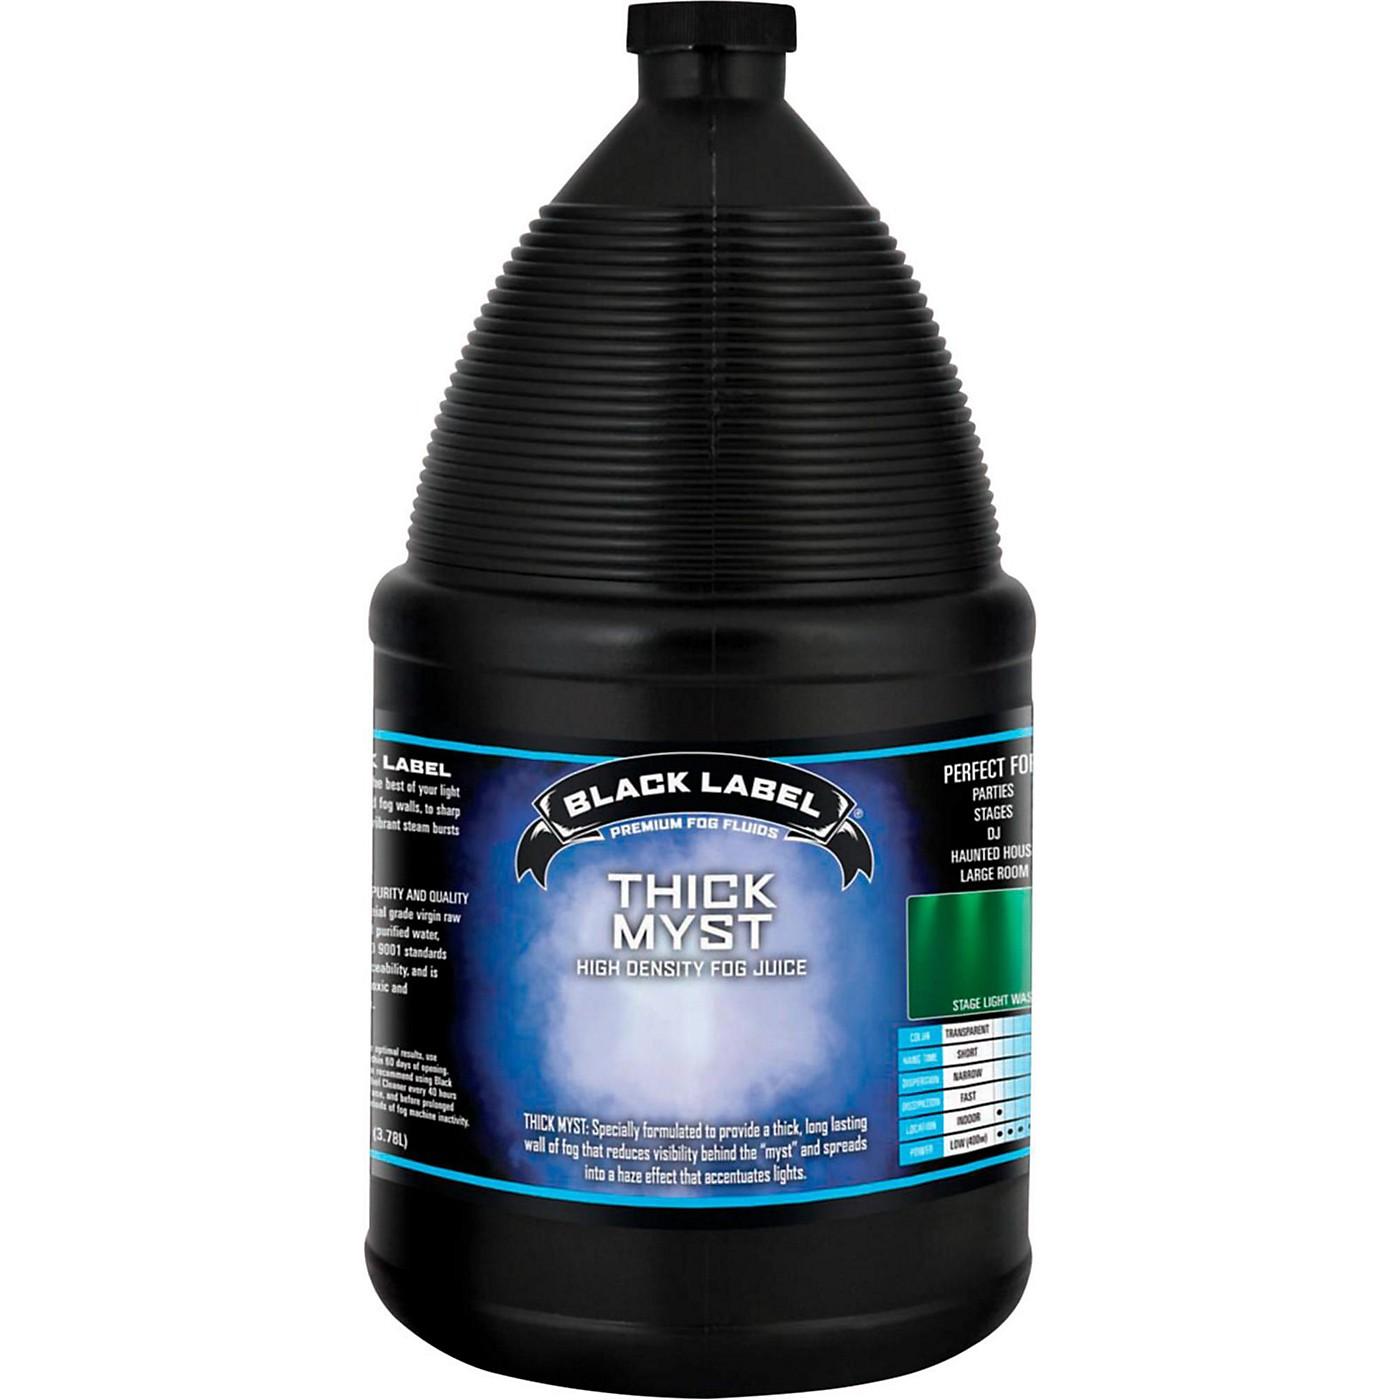 Black Label Thick Myst High Density Fog Juice - 1 Gallon thumbnail